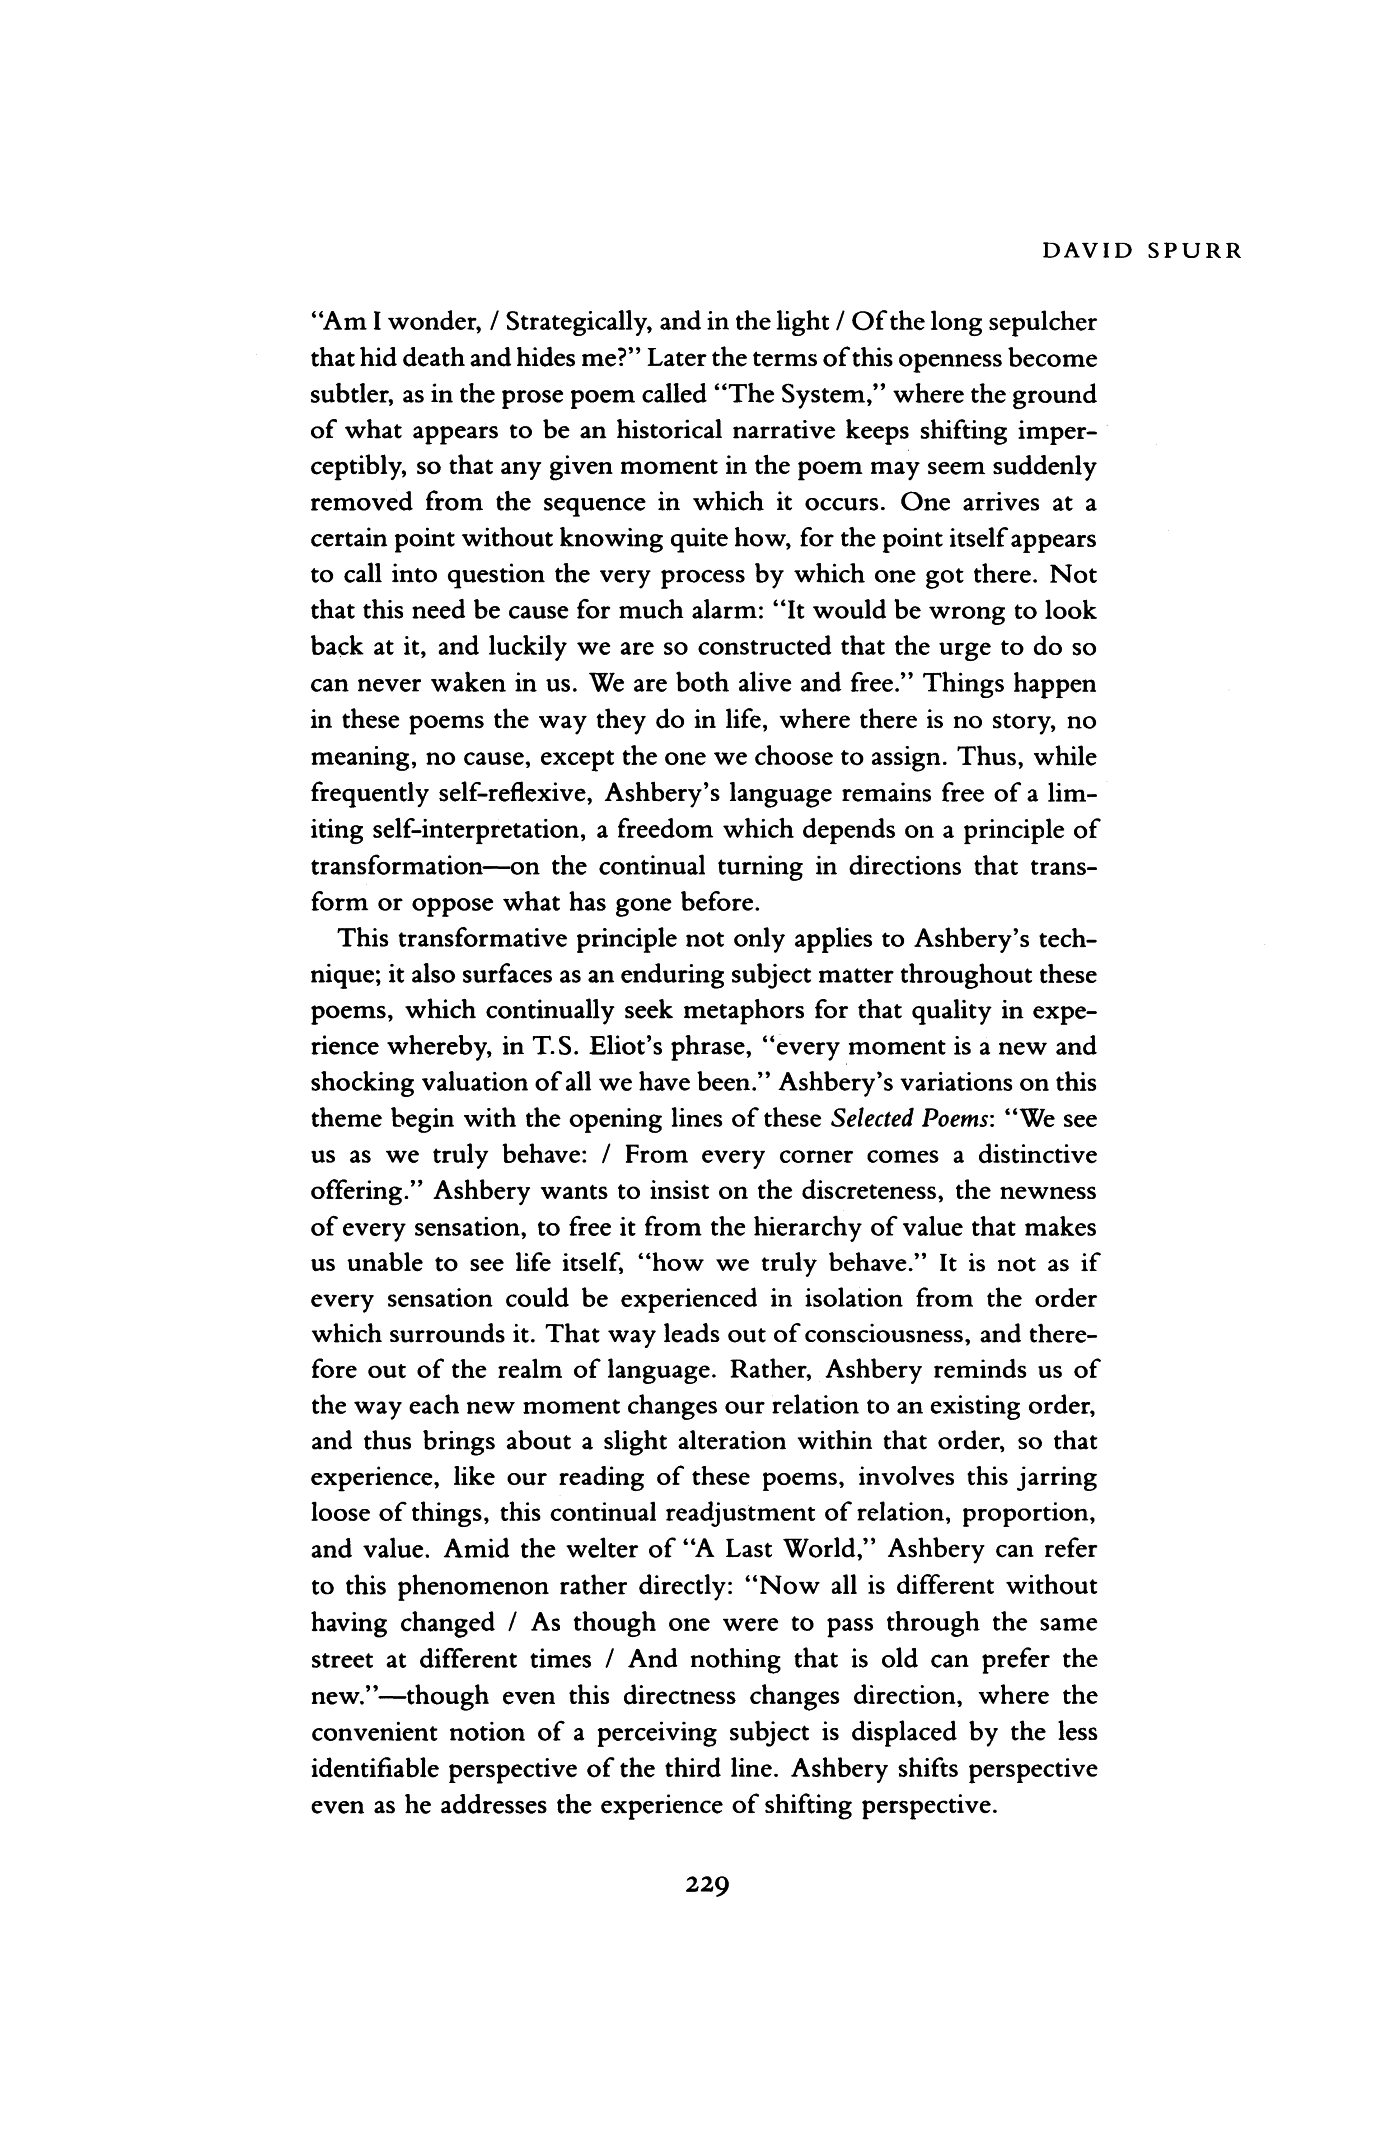 Propylene production via metathesis